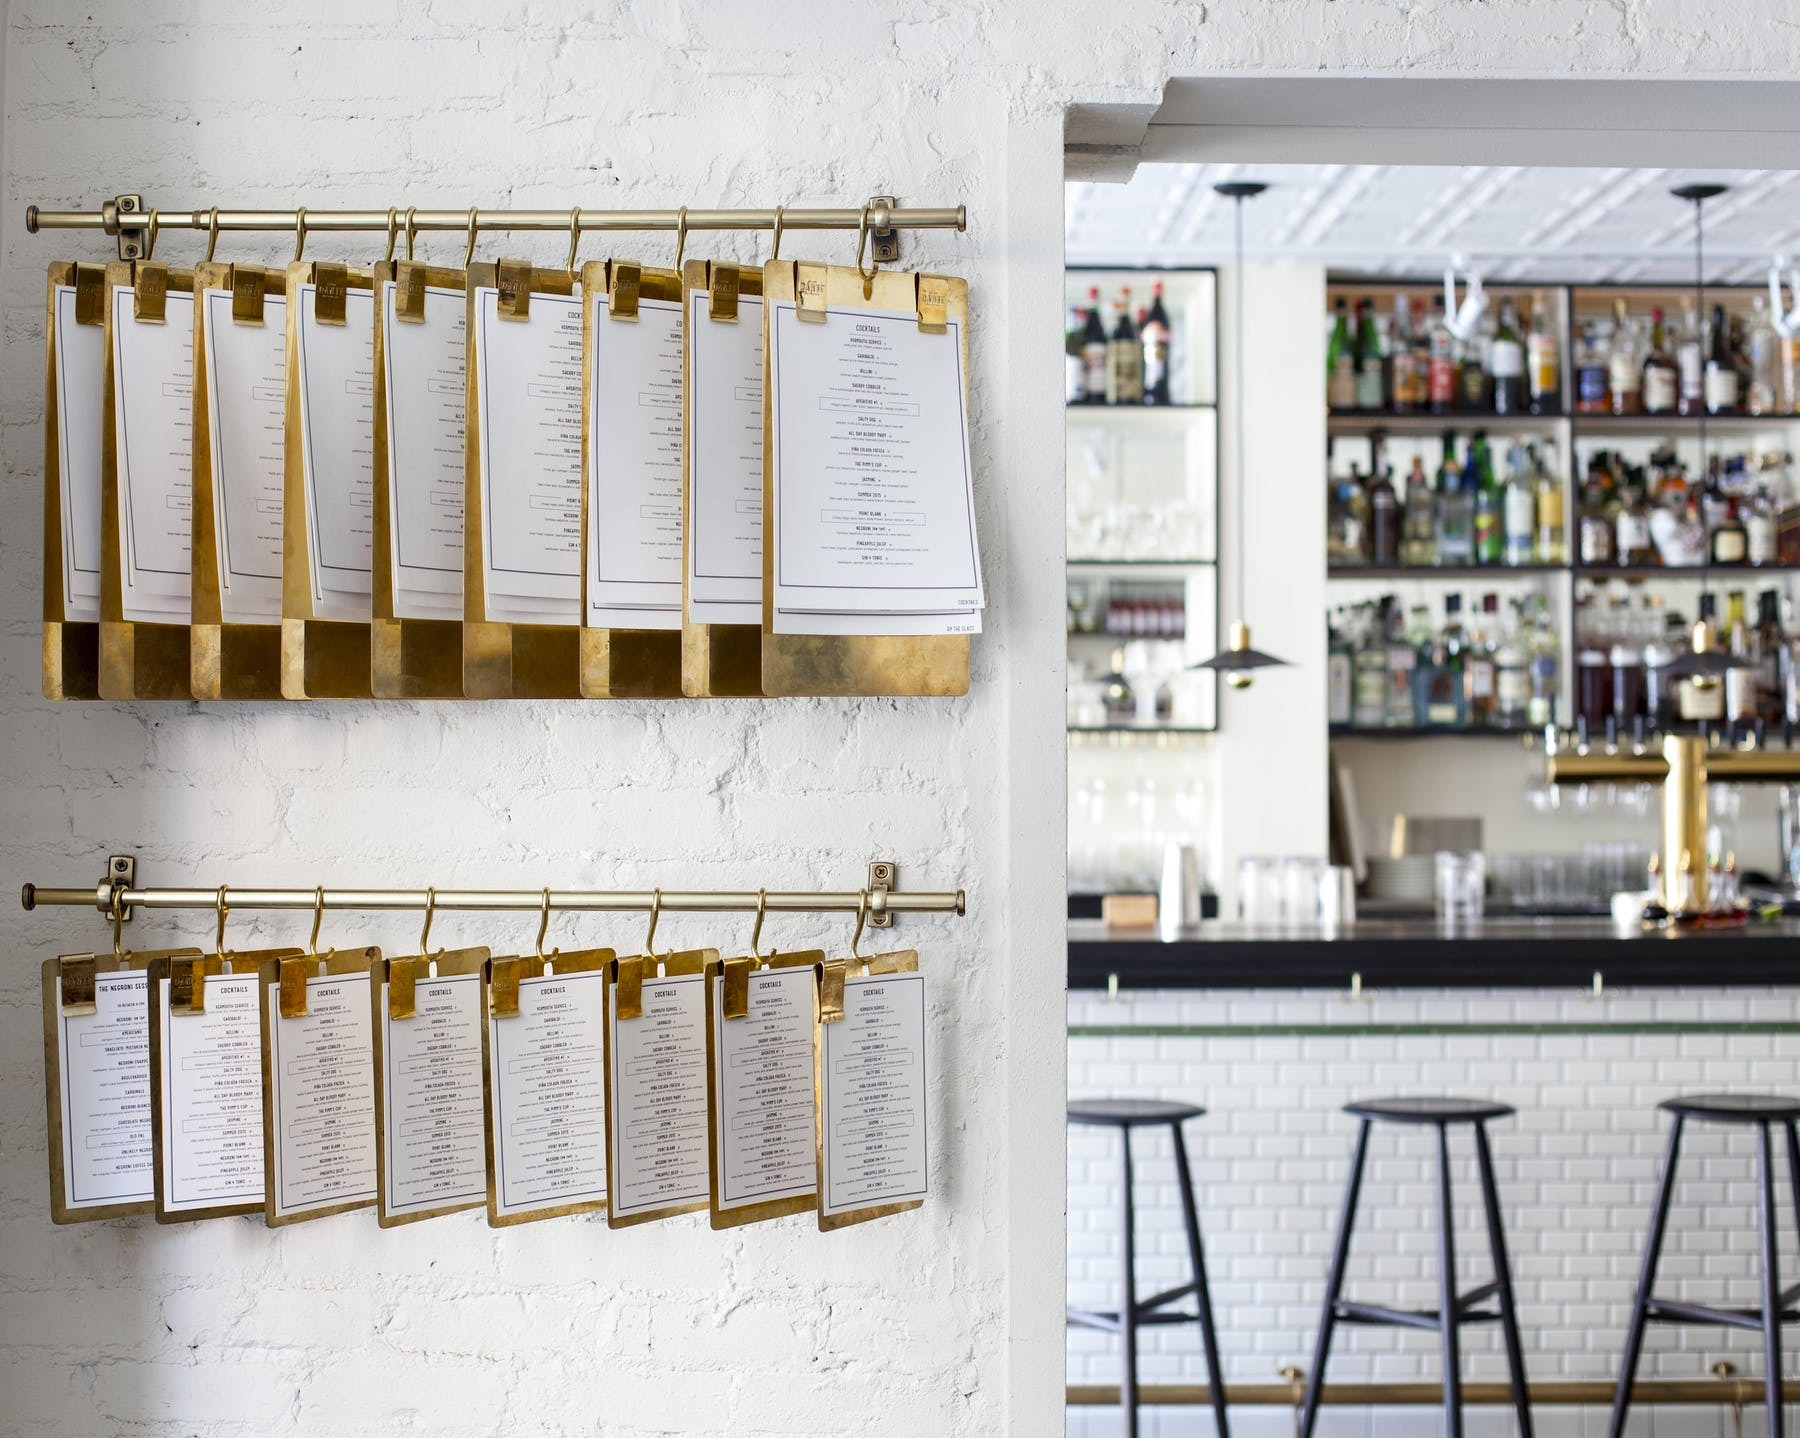 menus on the wall